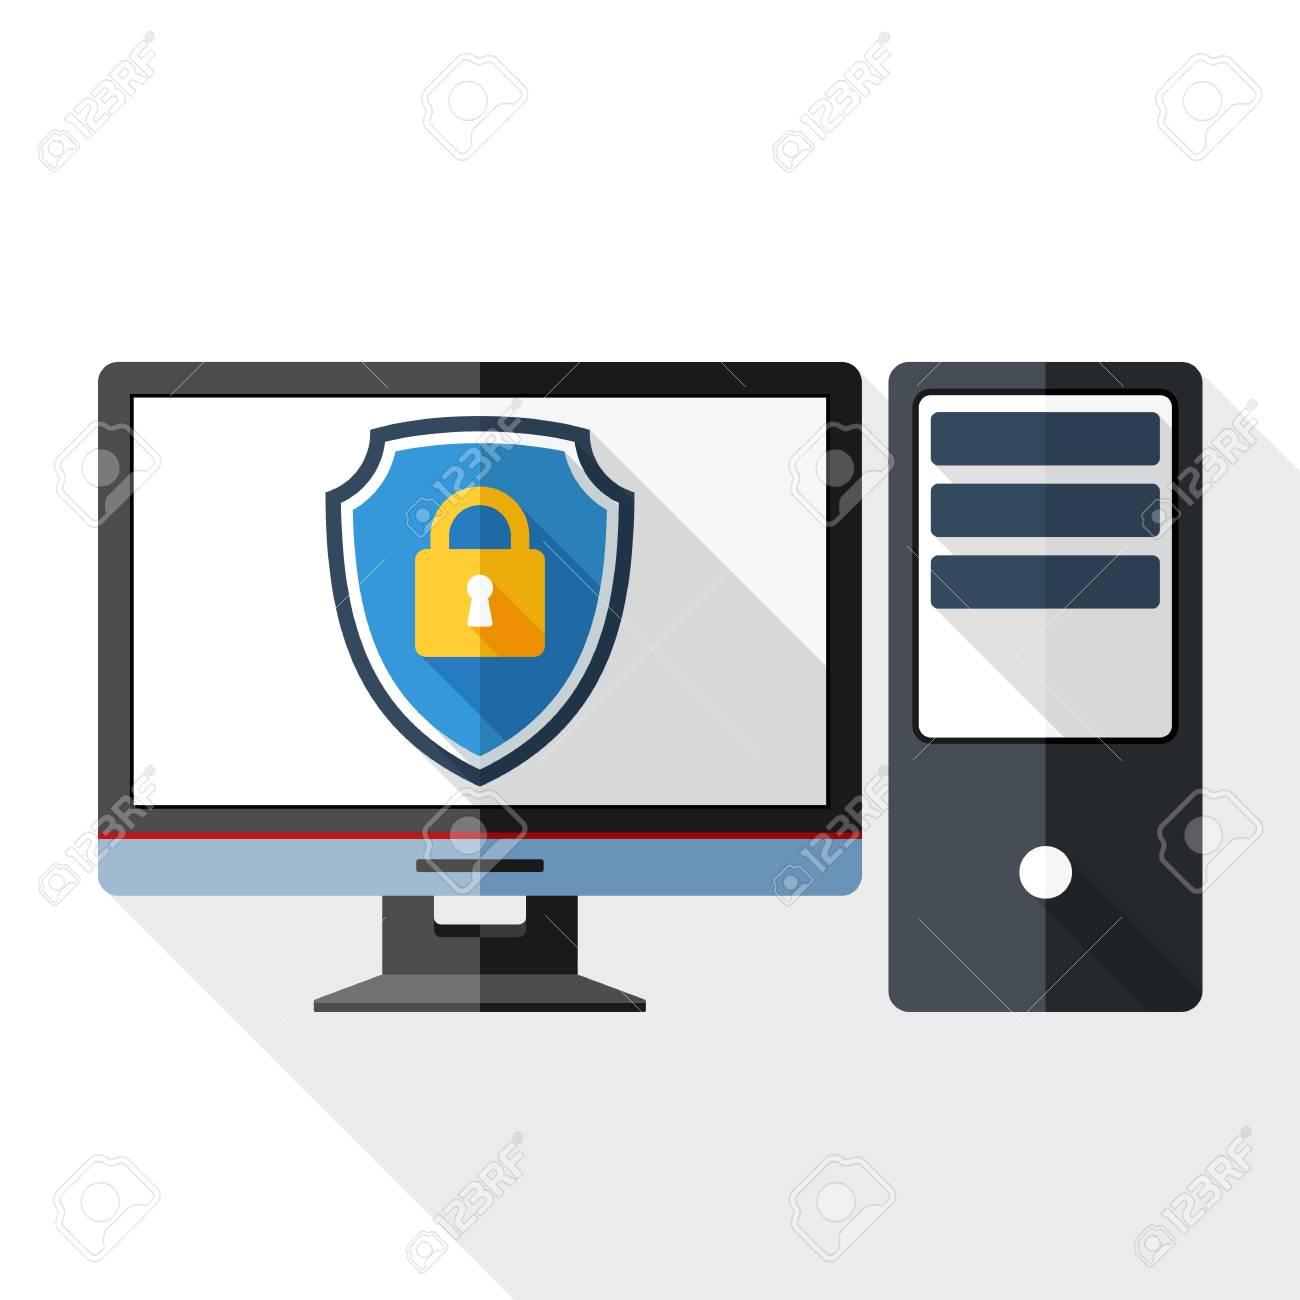 Vector Desktop Computer Icon With A Protective Shield Symbol